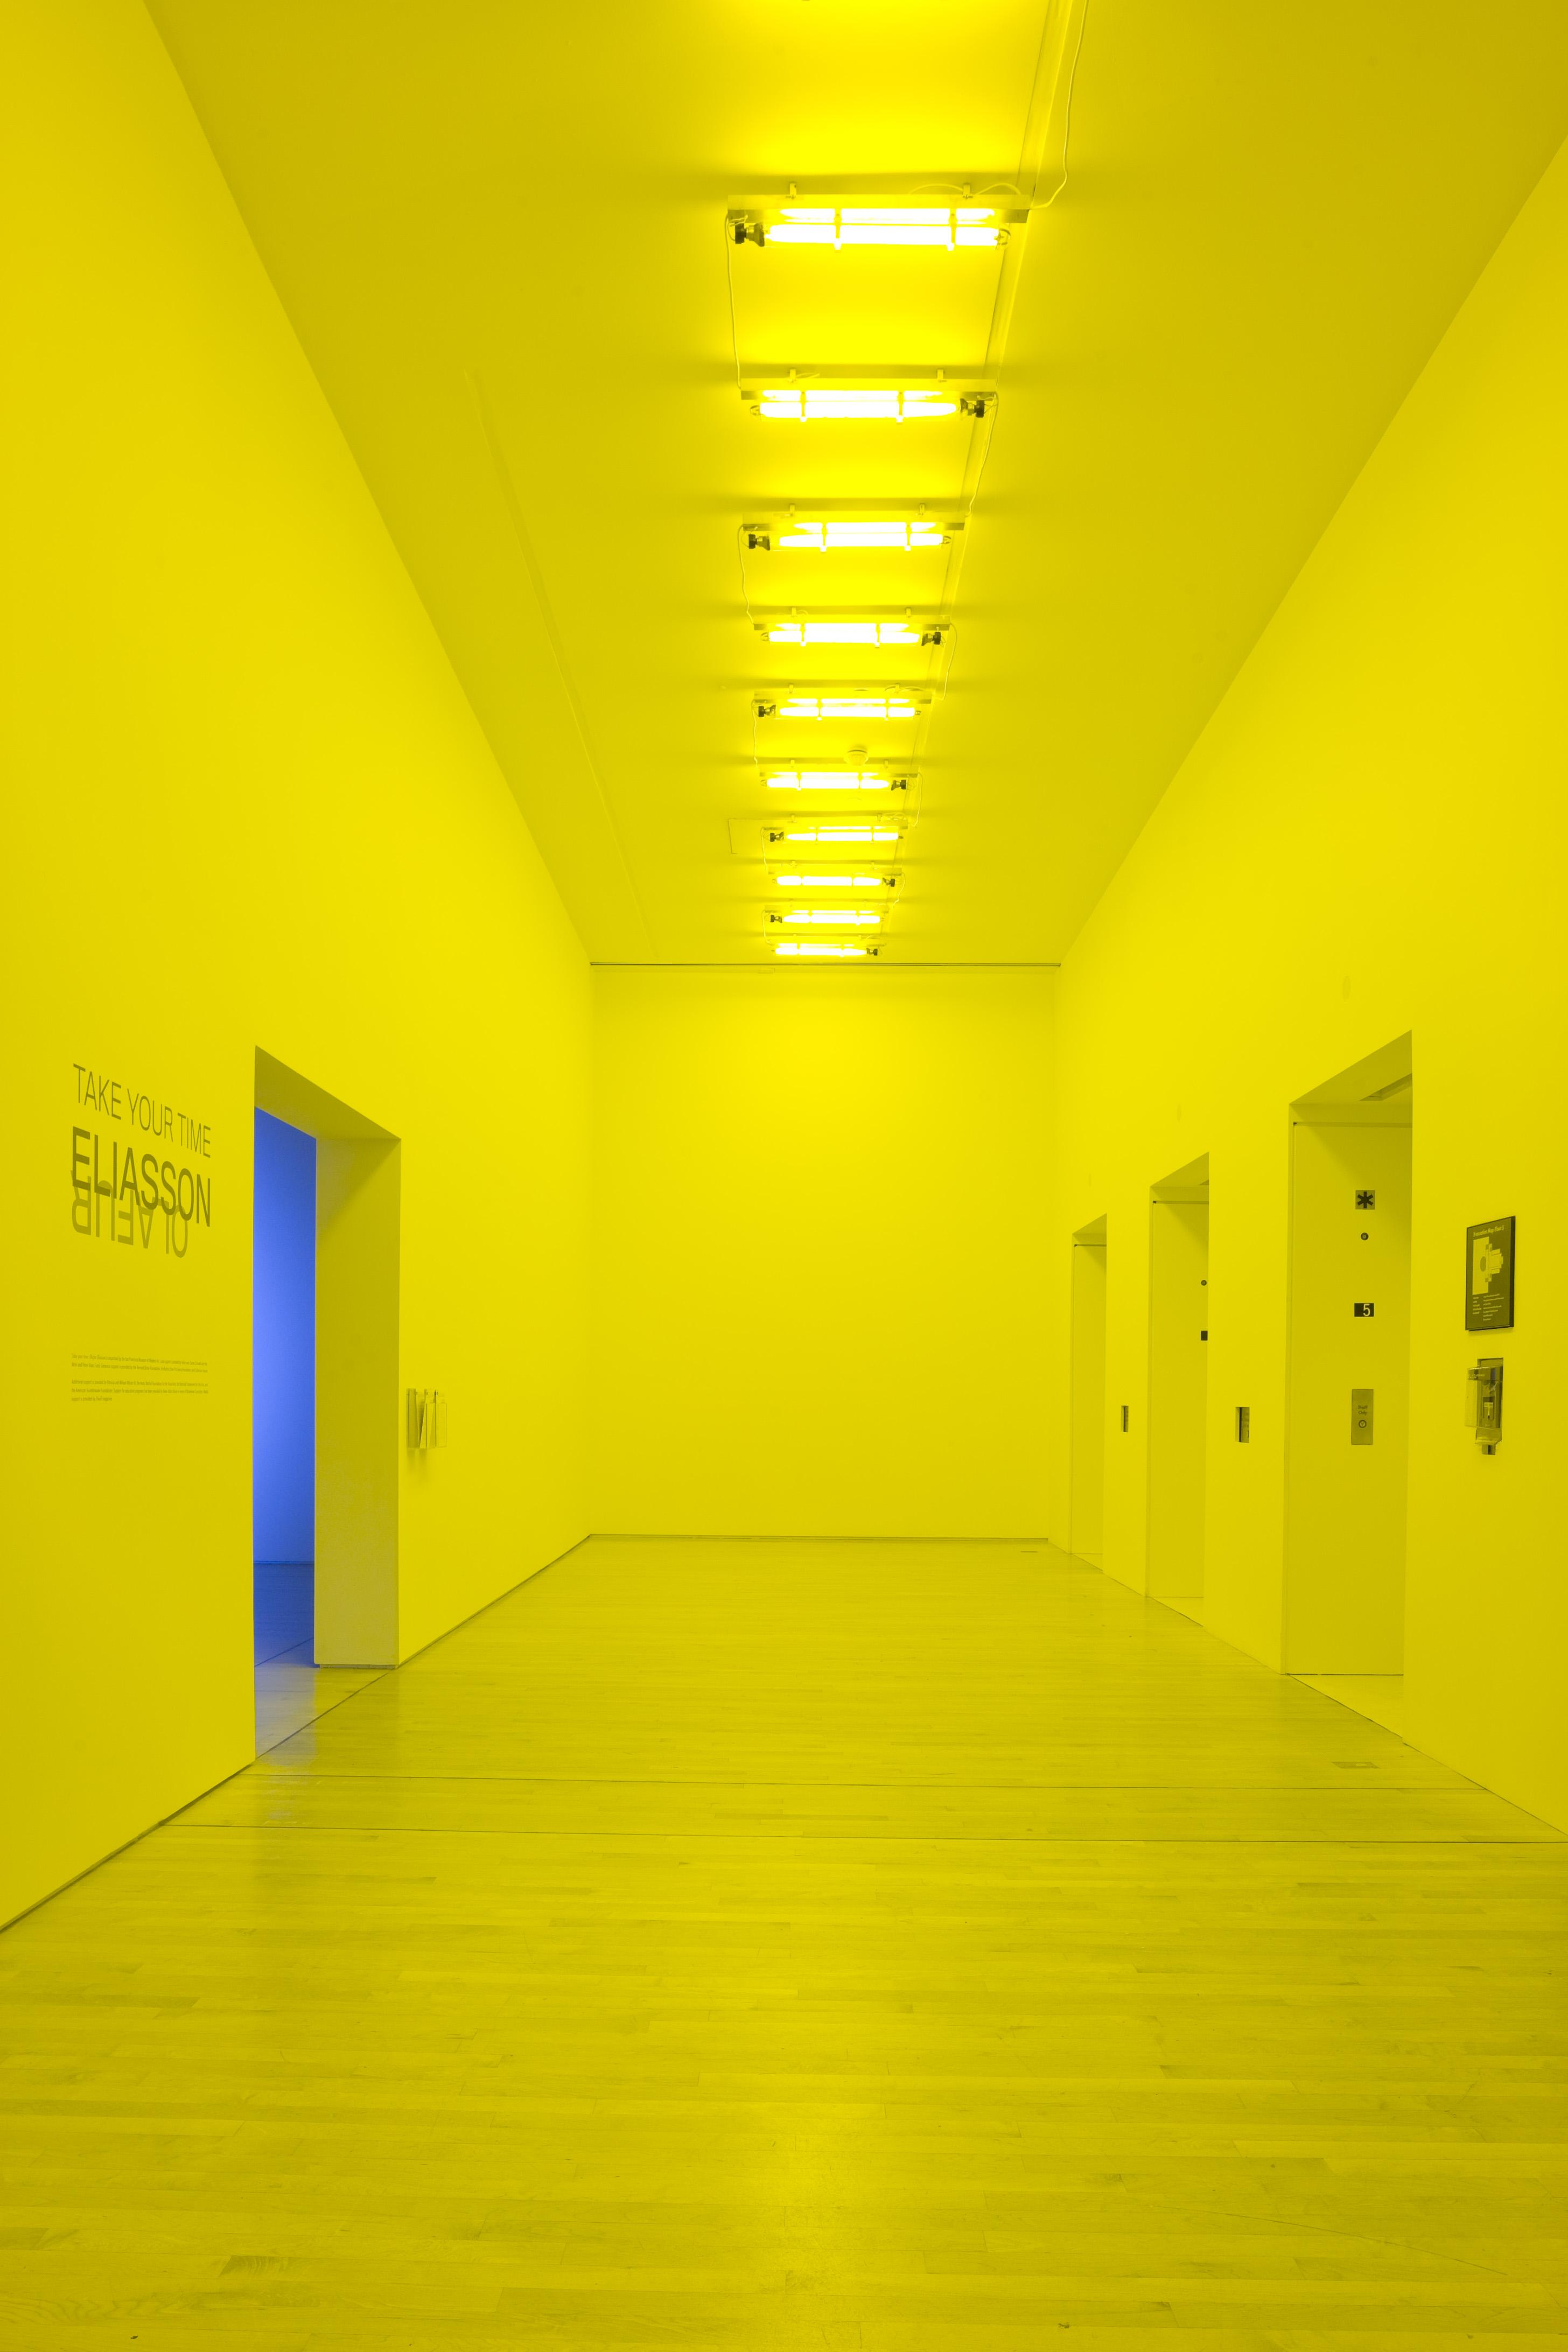 Olafur Eliasson, Room for one colour, 1997. Installation view at San Francisco Museum of Modern Art on the occasion of Take your time: Olafur Eliasson; photo: Ian Reeves, courtesy SFMOMA; © 2009 Olafur Eliasson